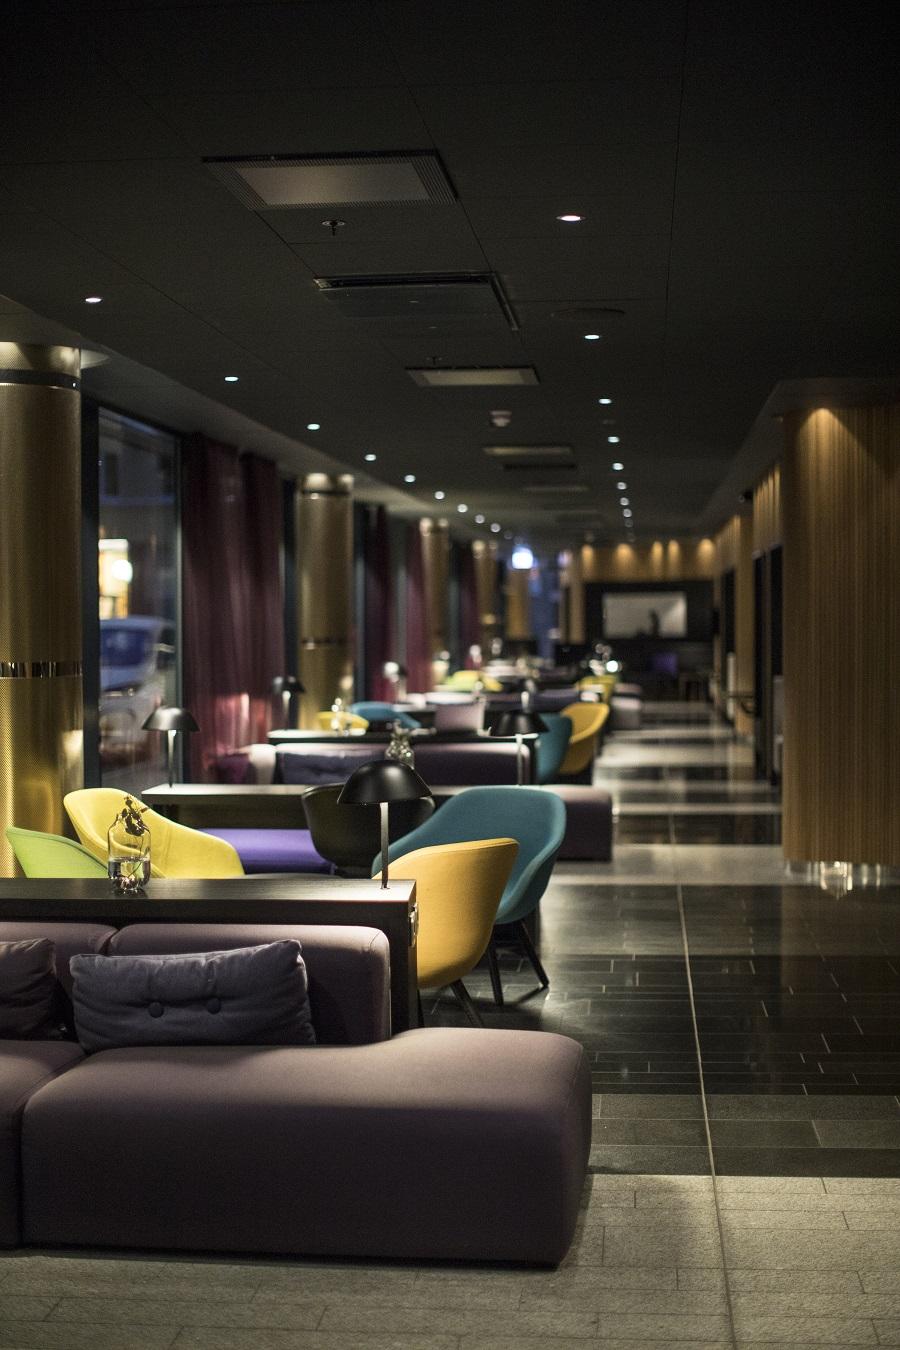 Introducing the Småland Region of Sweden - VOX Hotel